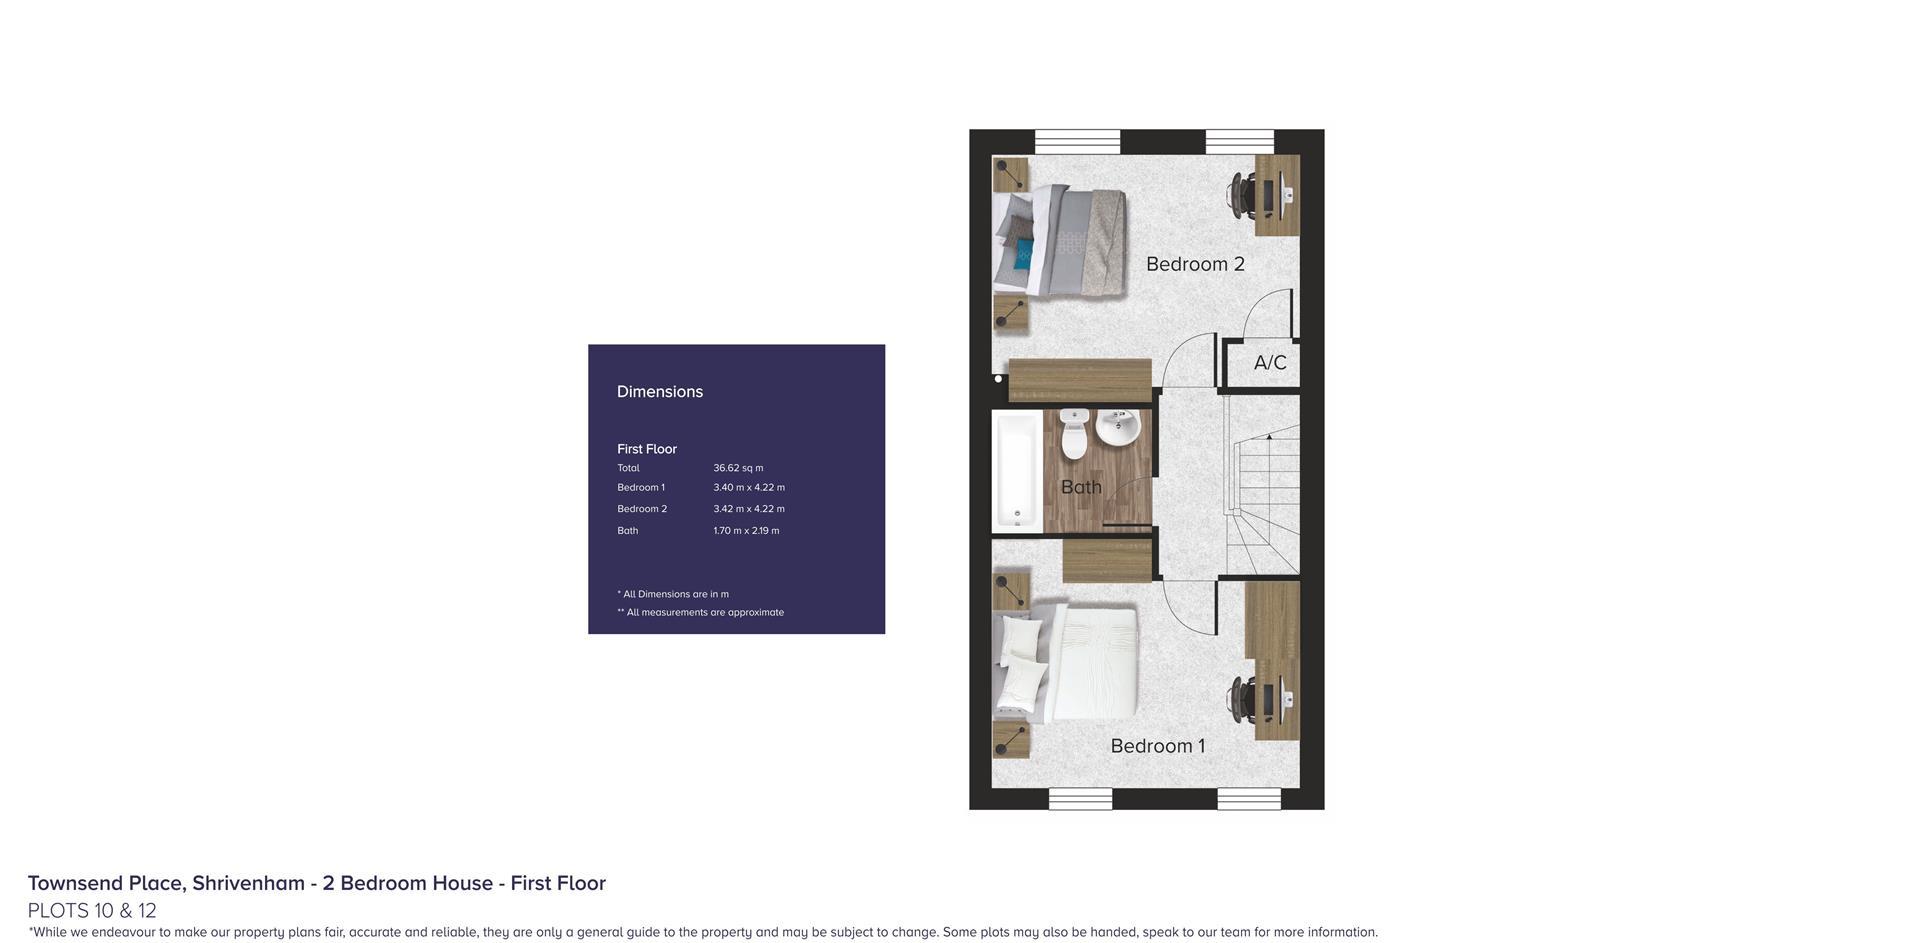 Townsend Place, Shrivenham_Plots 10 & 12_FF_B.jpg